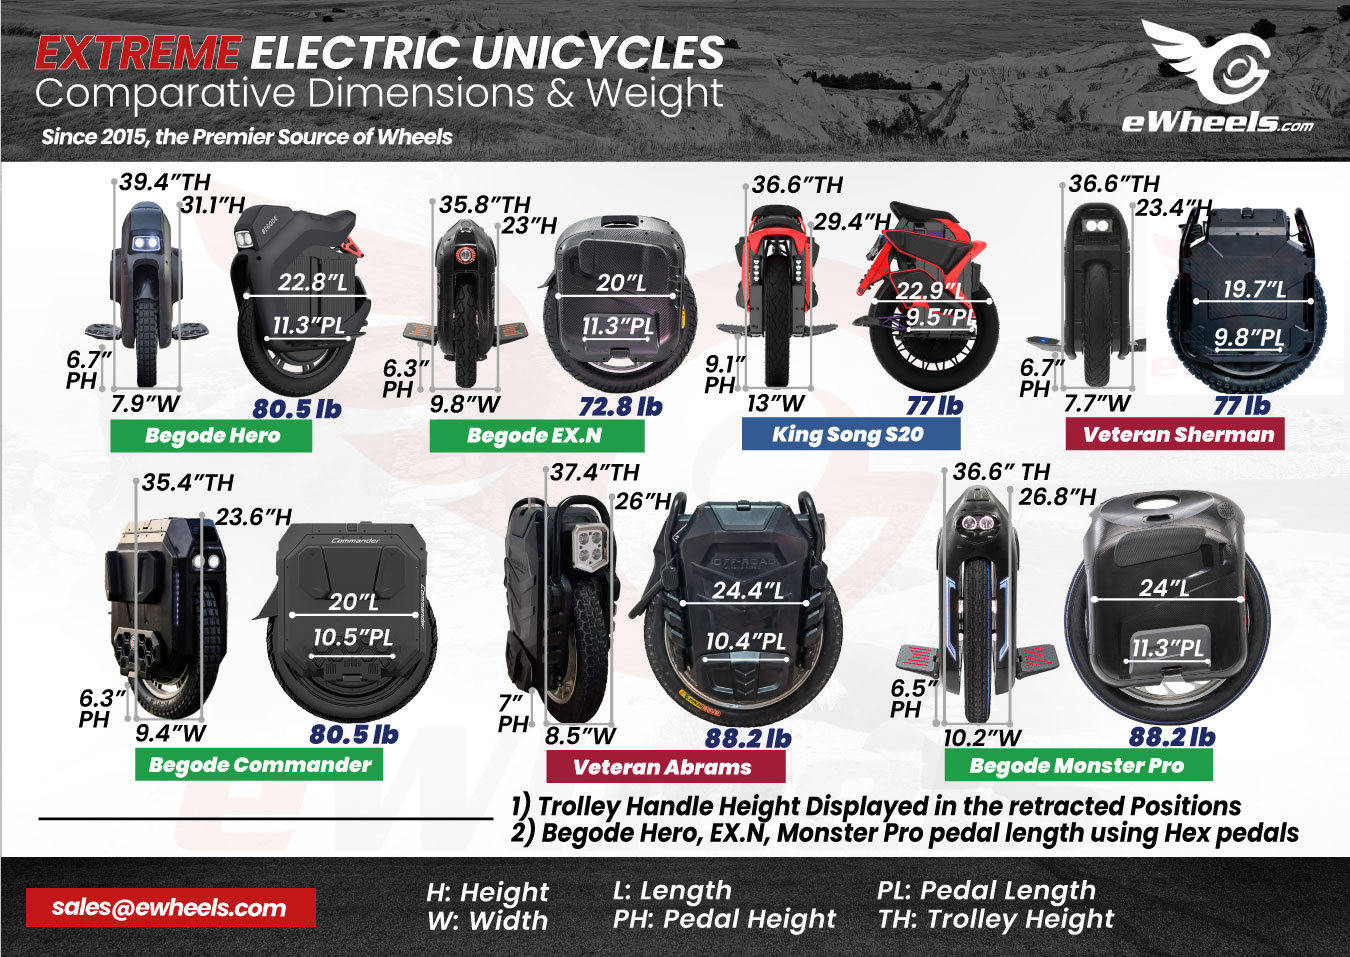 Extreme Electric Unicycle, Dimensions Weight Comparison, v1.2. Begode Hero, EX.N, King Song S20, Veteran Sherman, Begode Commander, Veteran Abrams, Monster Pro MonsterPro